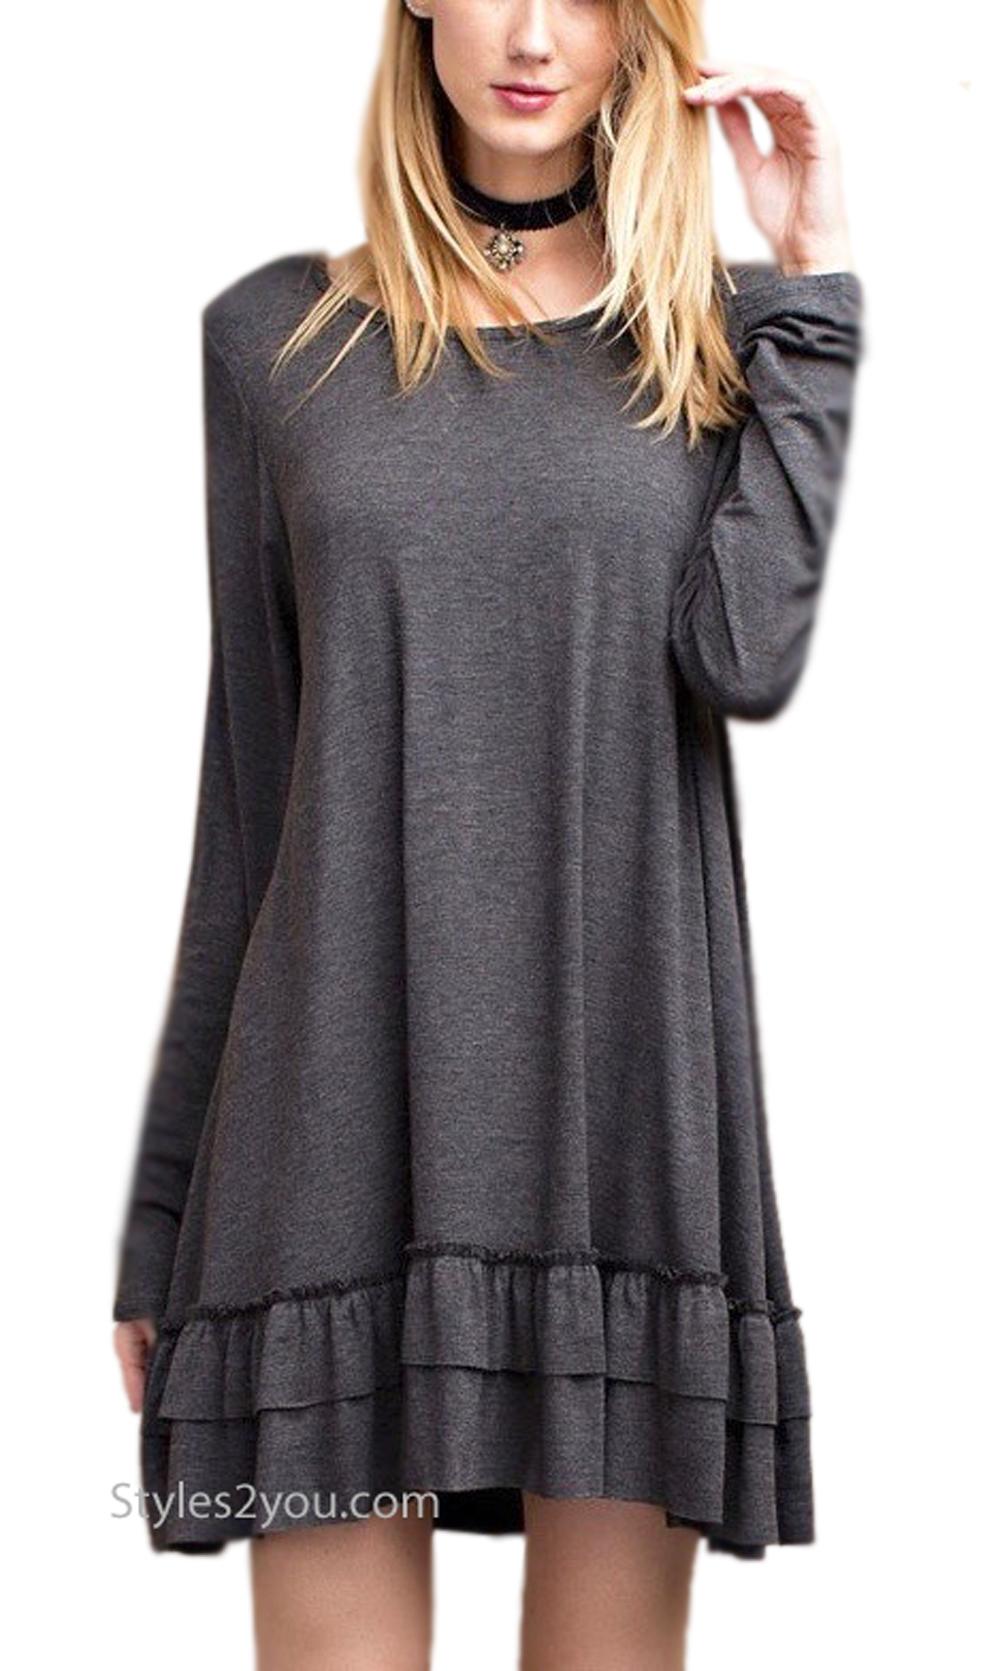 Celian PLUS SIZE Ruffle Shirt Dress Shirt Extender Gray Easel ...